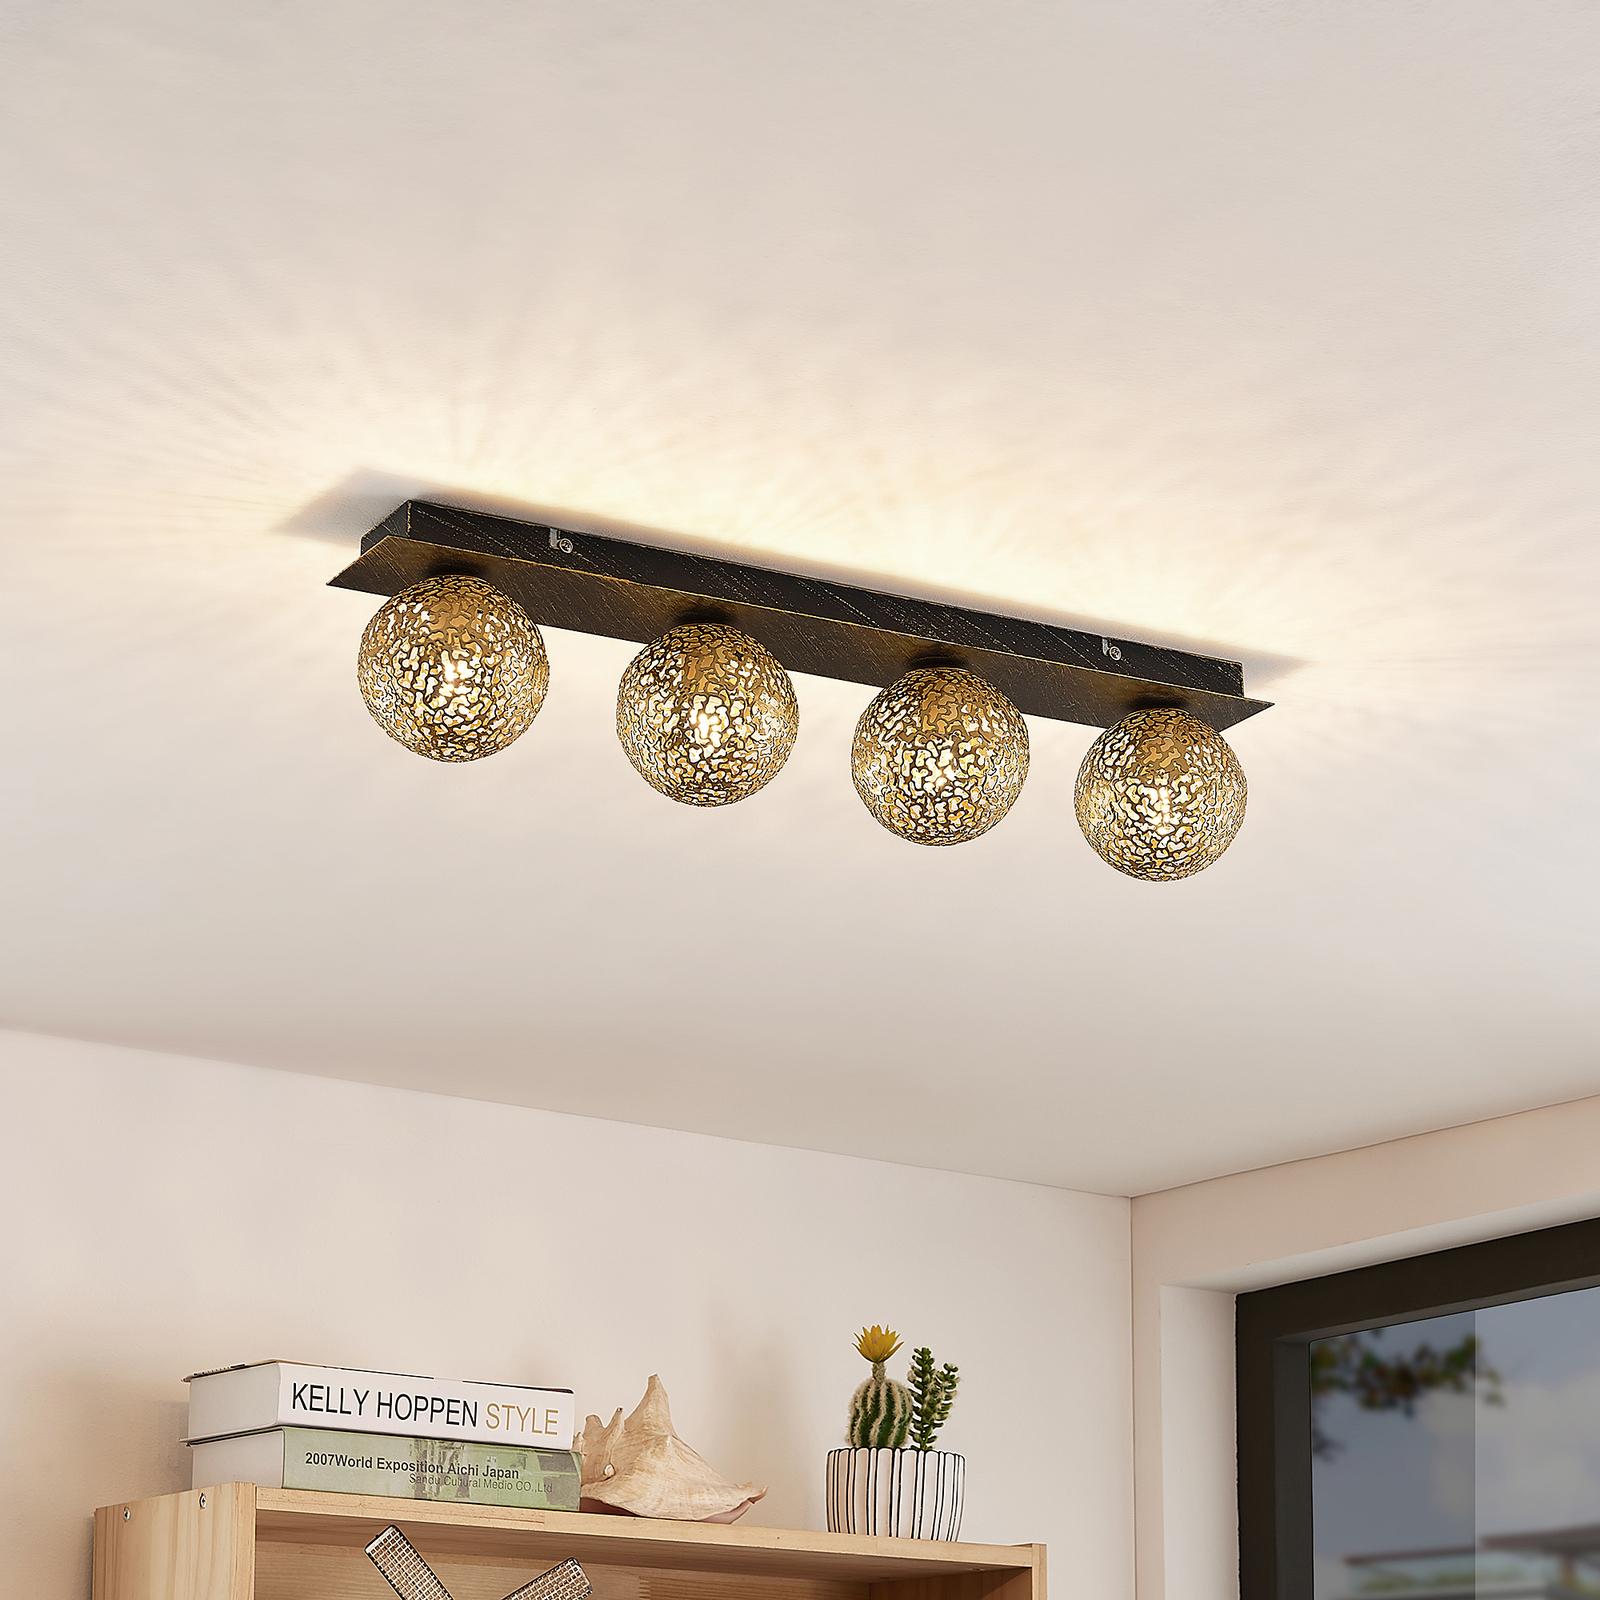 Lucande Evory lampa sufitowa, kątowa, 4-punktowa